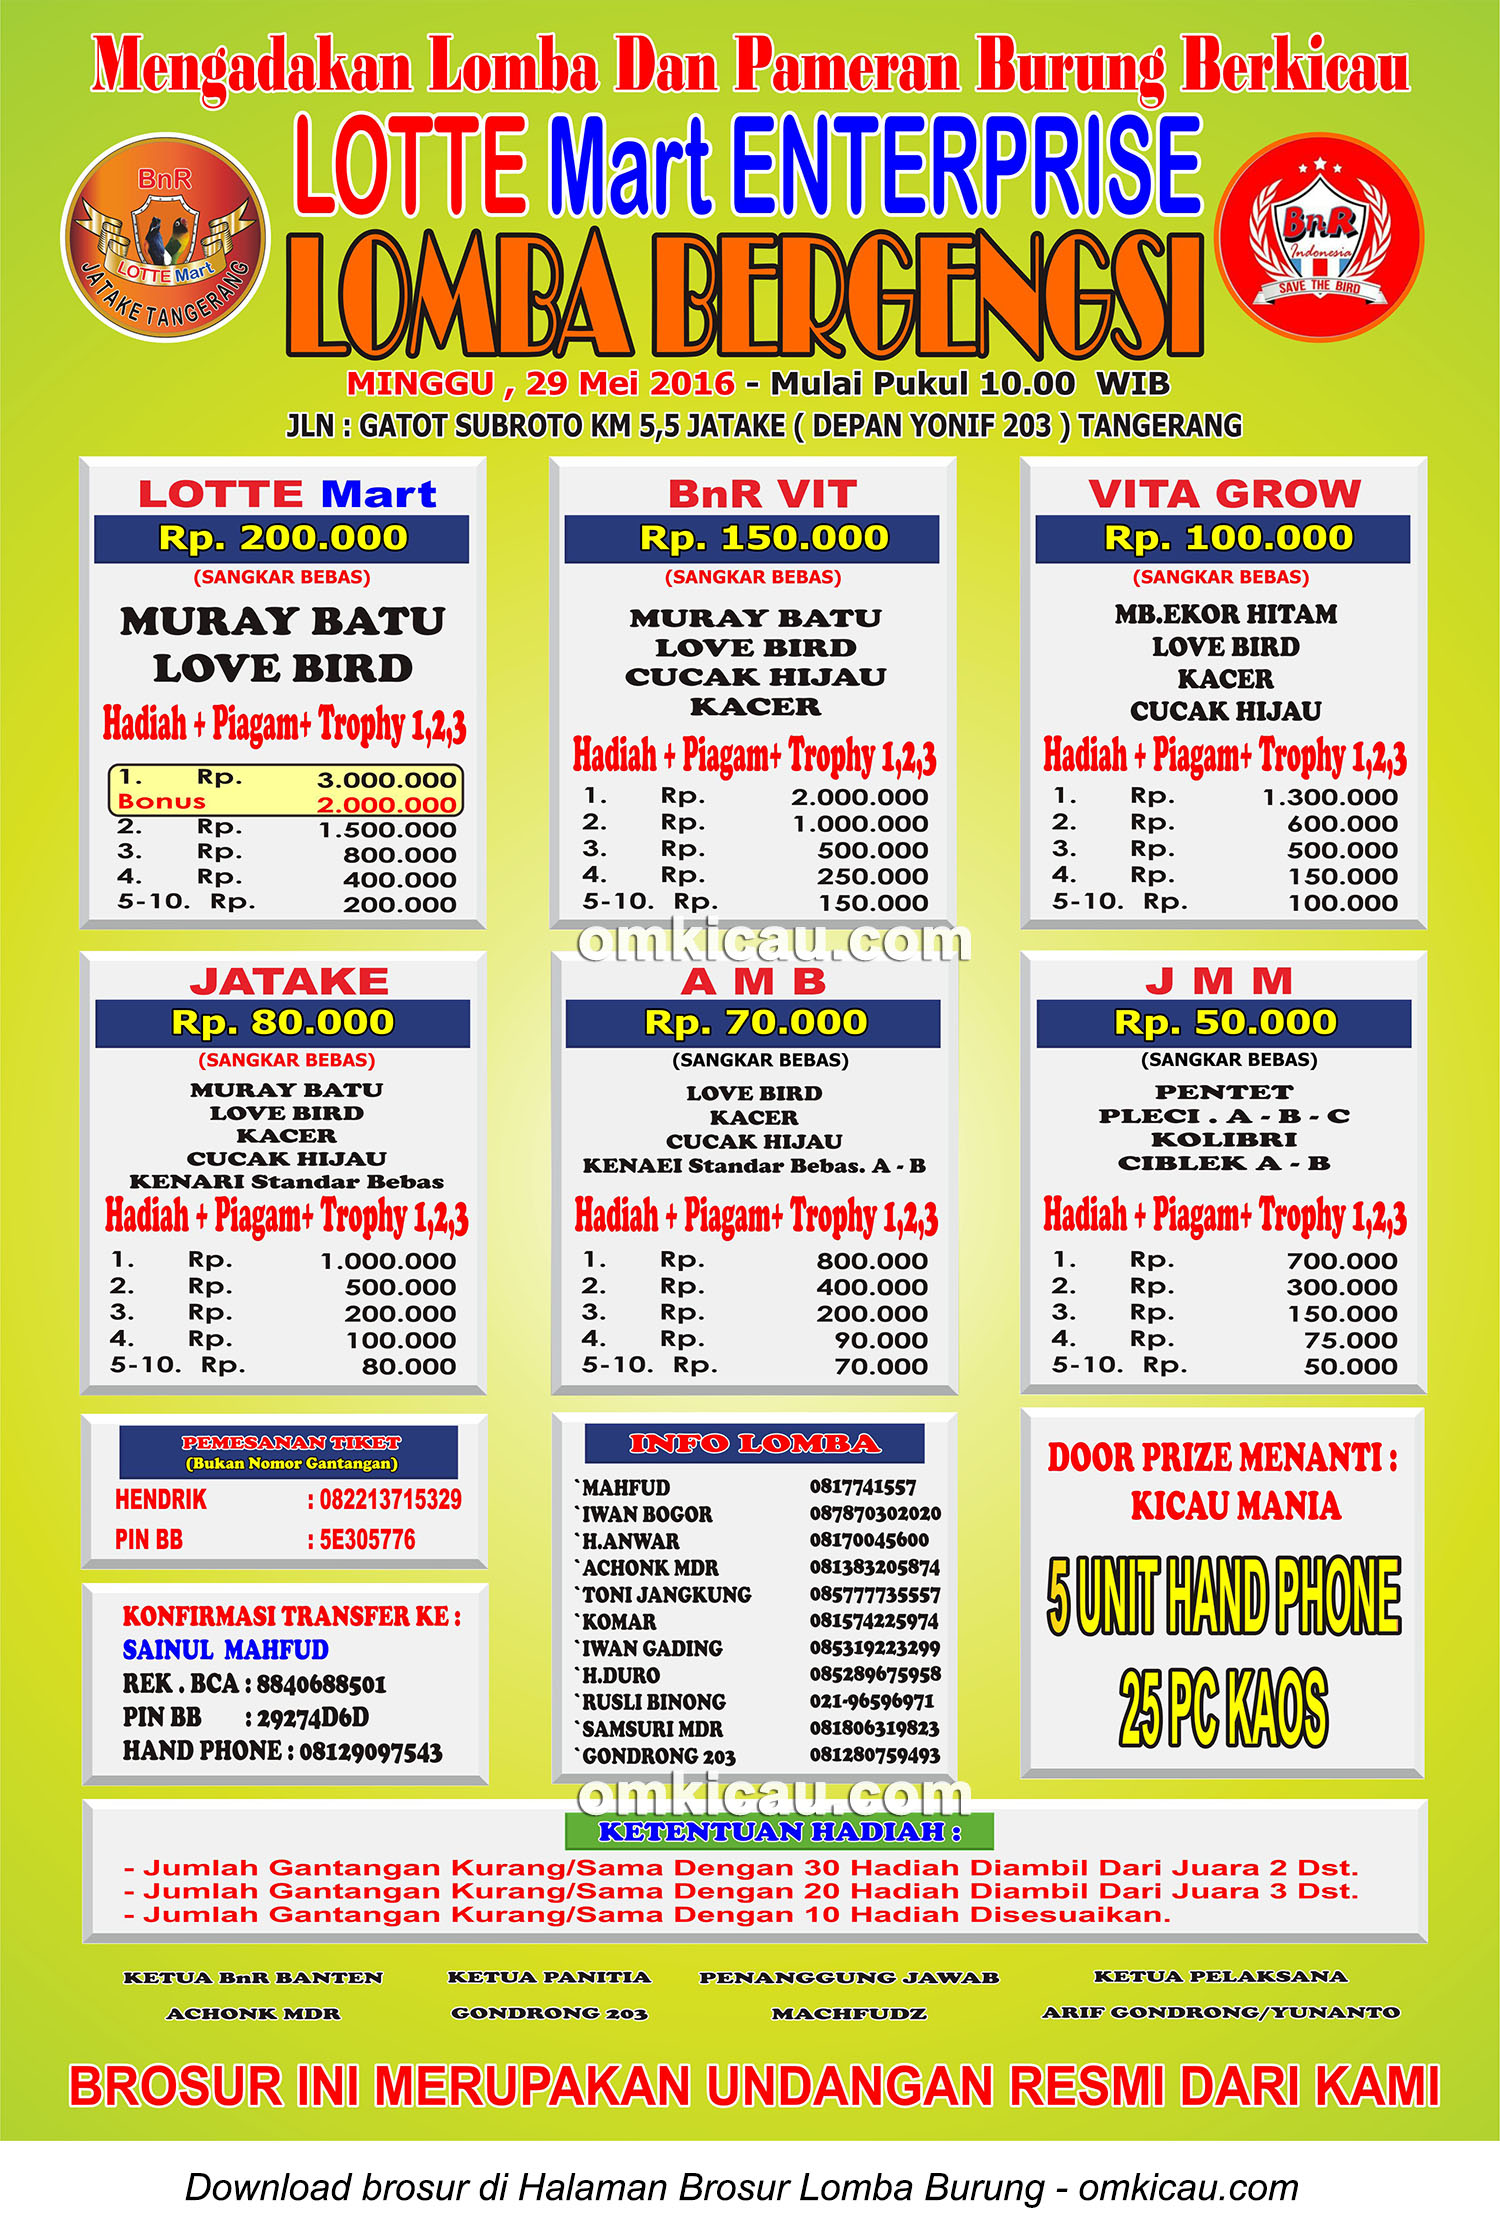 Brosur Revisi Lomba Bergengsi Lotte Mart Enterprise Tangerang, 29 Mei 2016